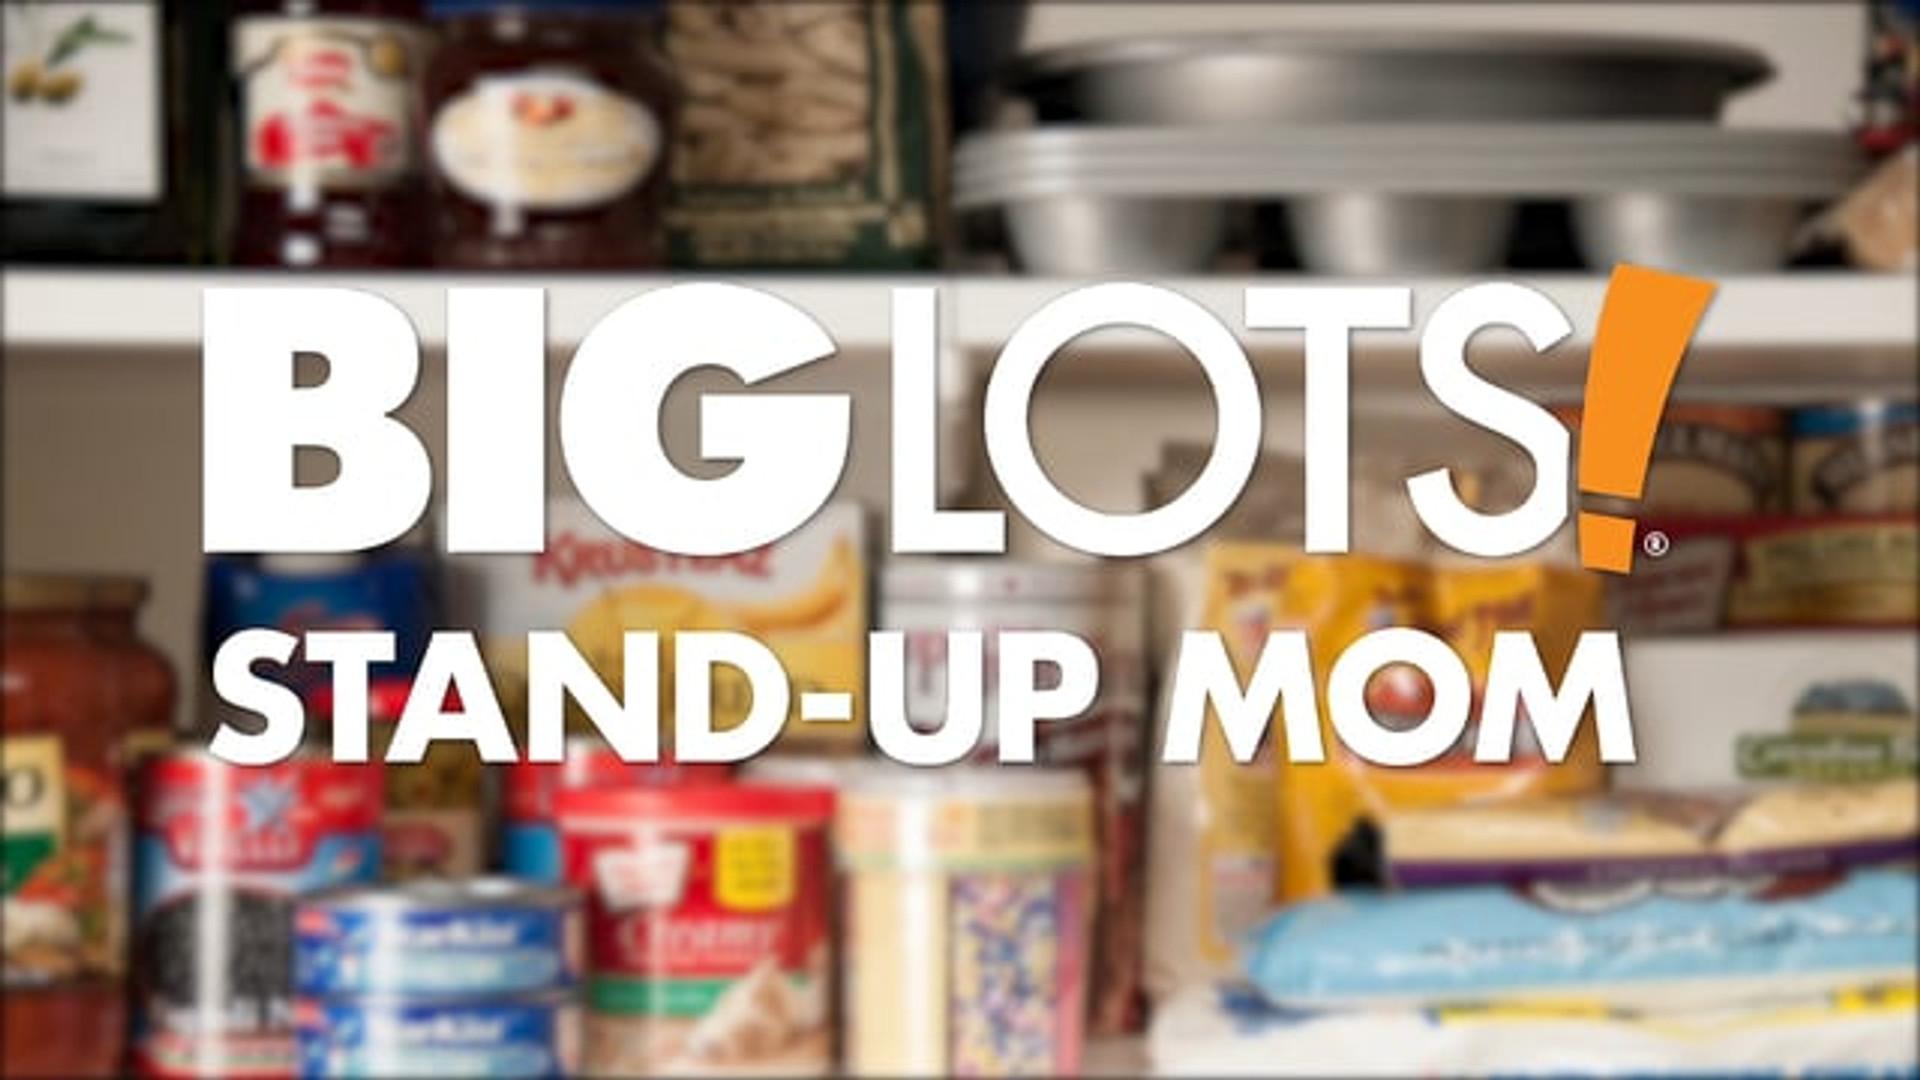 BIG LOTS - STAND-UP MOM - STOCKTOBER